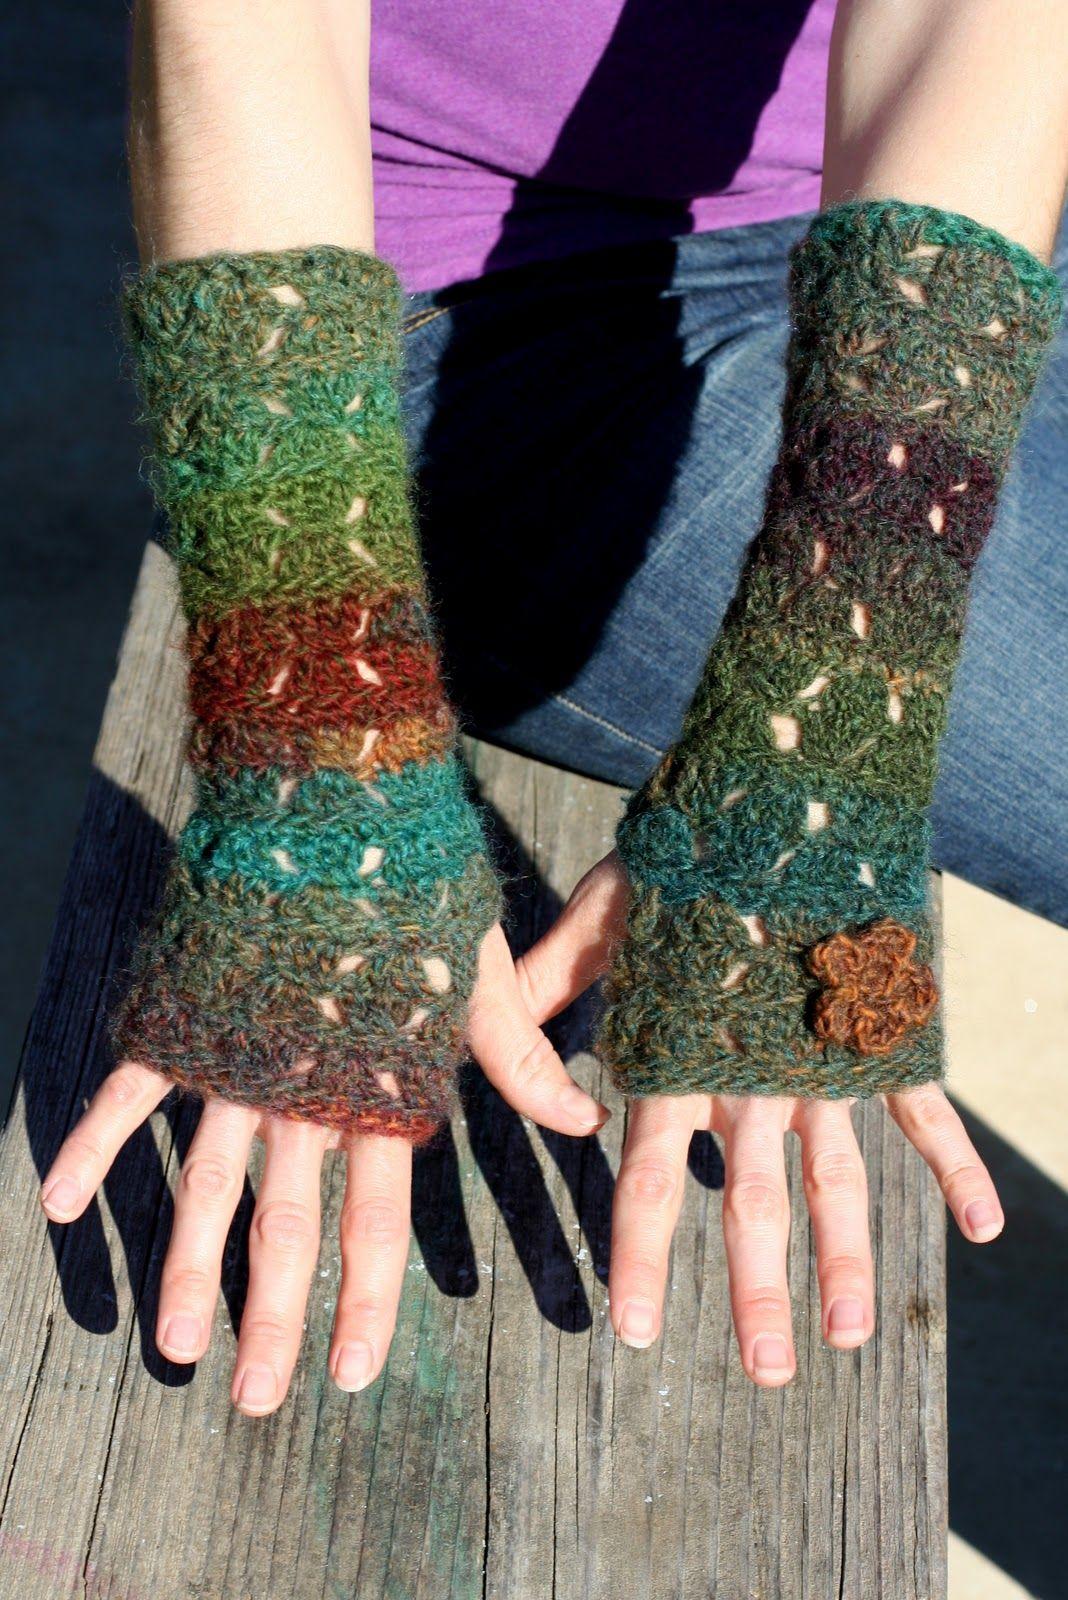 Fingerless gloves darn yarn - Fingerless Gloves Darn Yarn 39